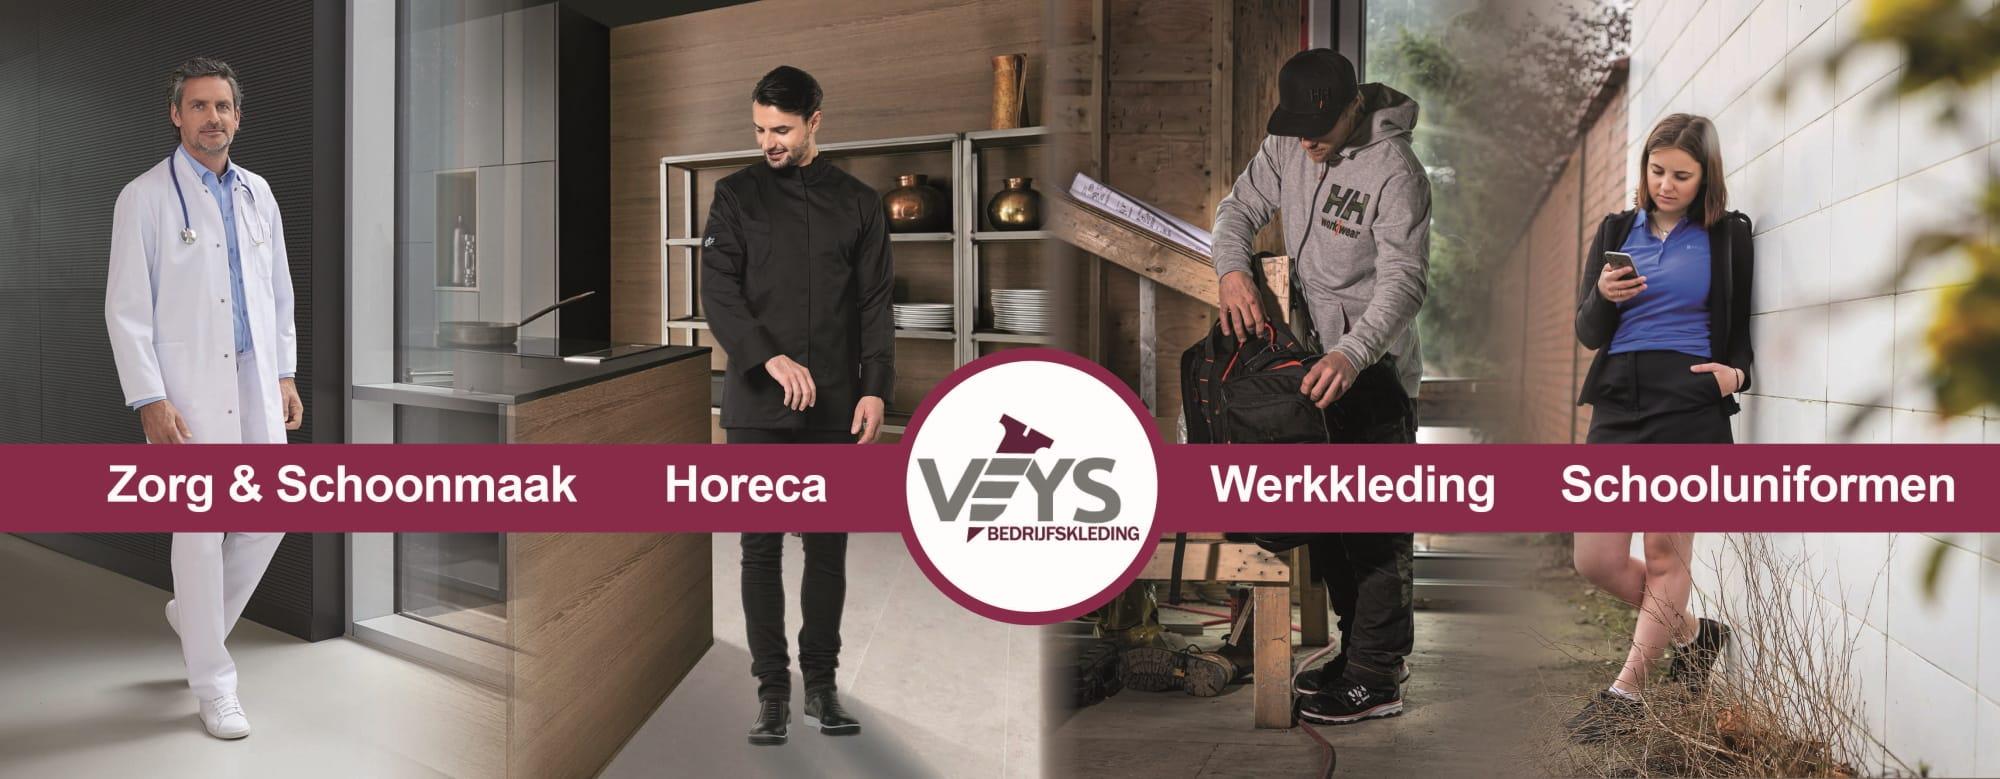 Bedrijfskleding zorg, schoonmaak, horeca & schooluniformen - VEYS werkkledij